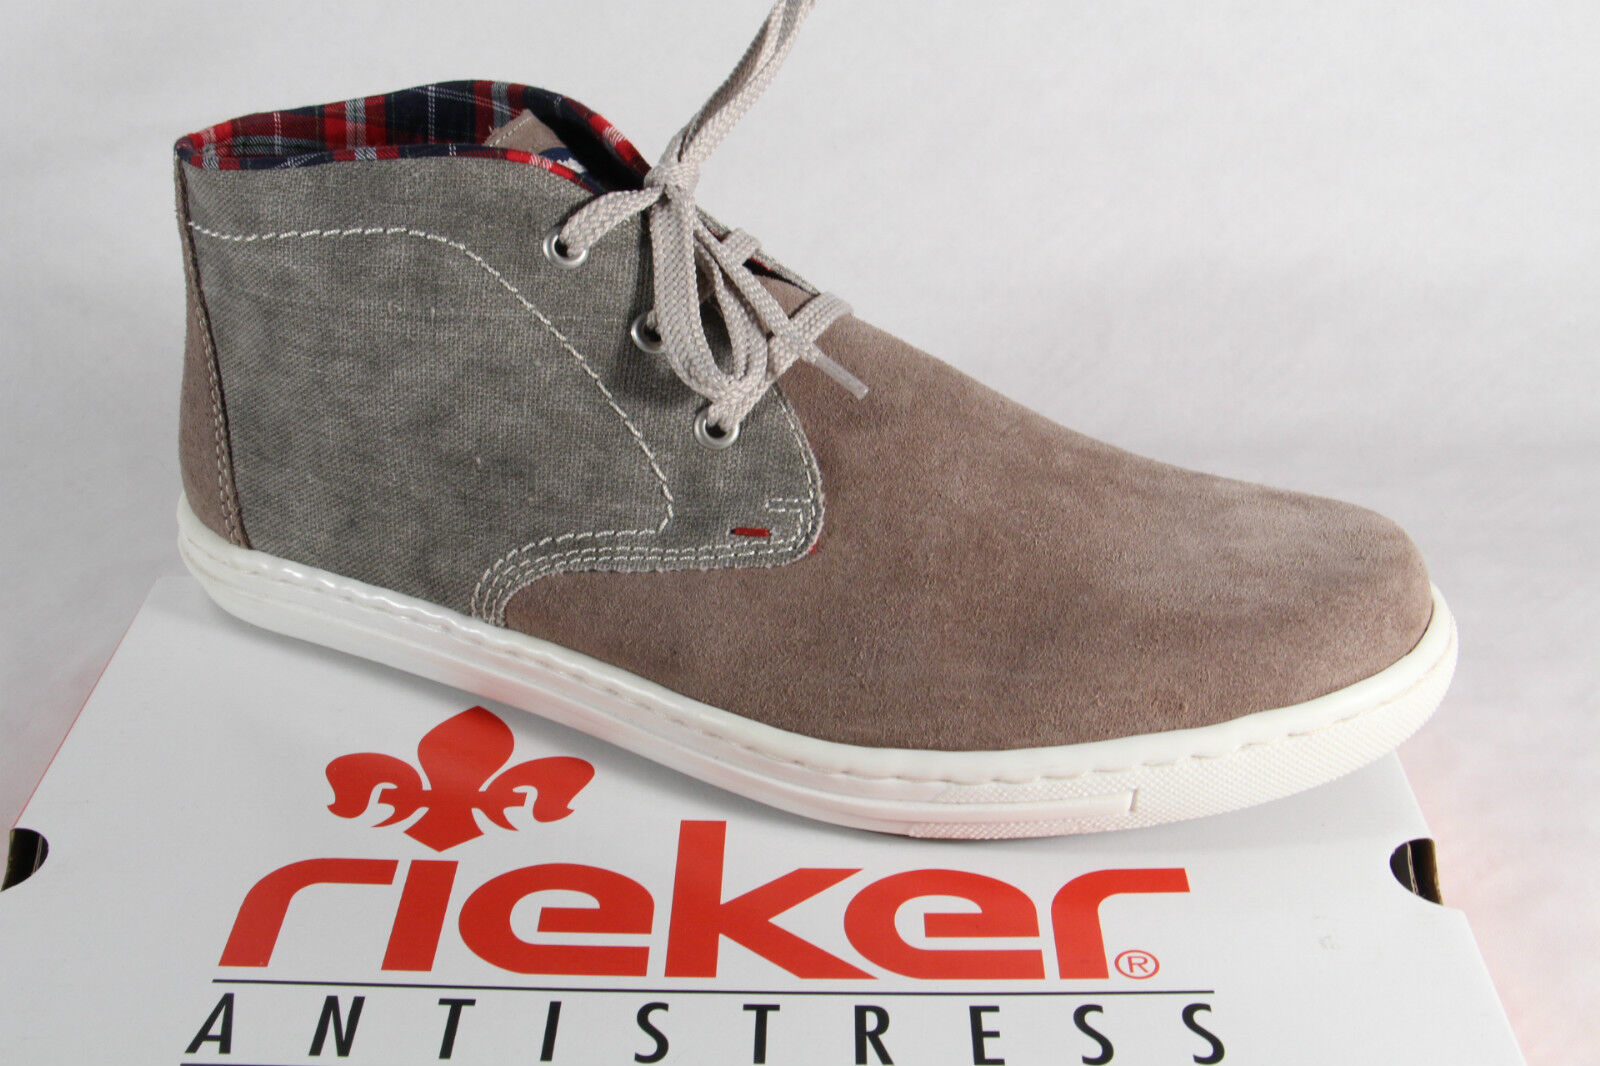 Kostenloser Versand 27813 36e76 Rieker Herren Schnürschuhe Sneaker Sportschuhe Halbschuhe Leder grau NEU!